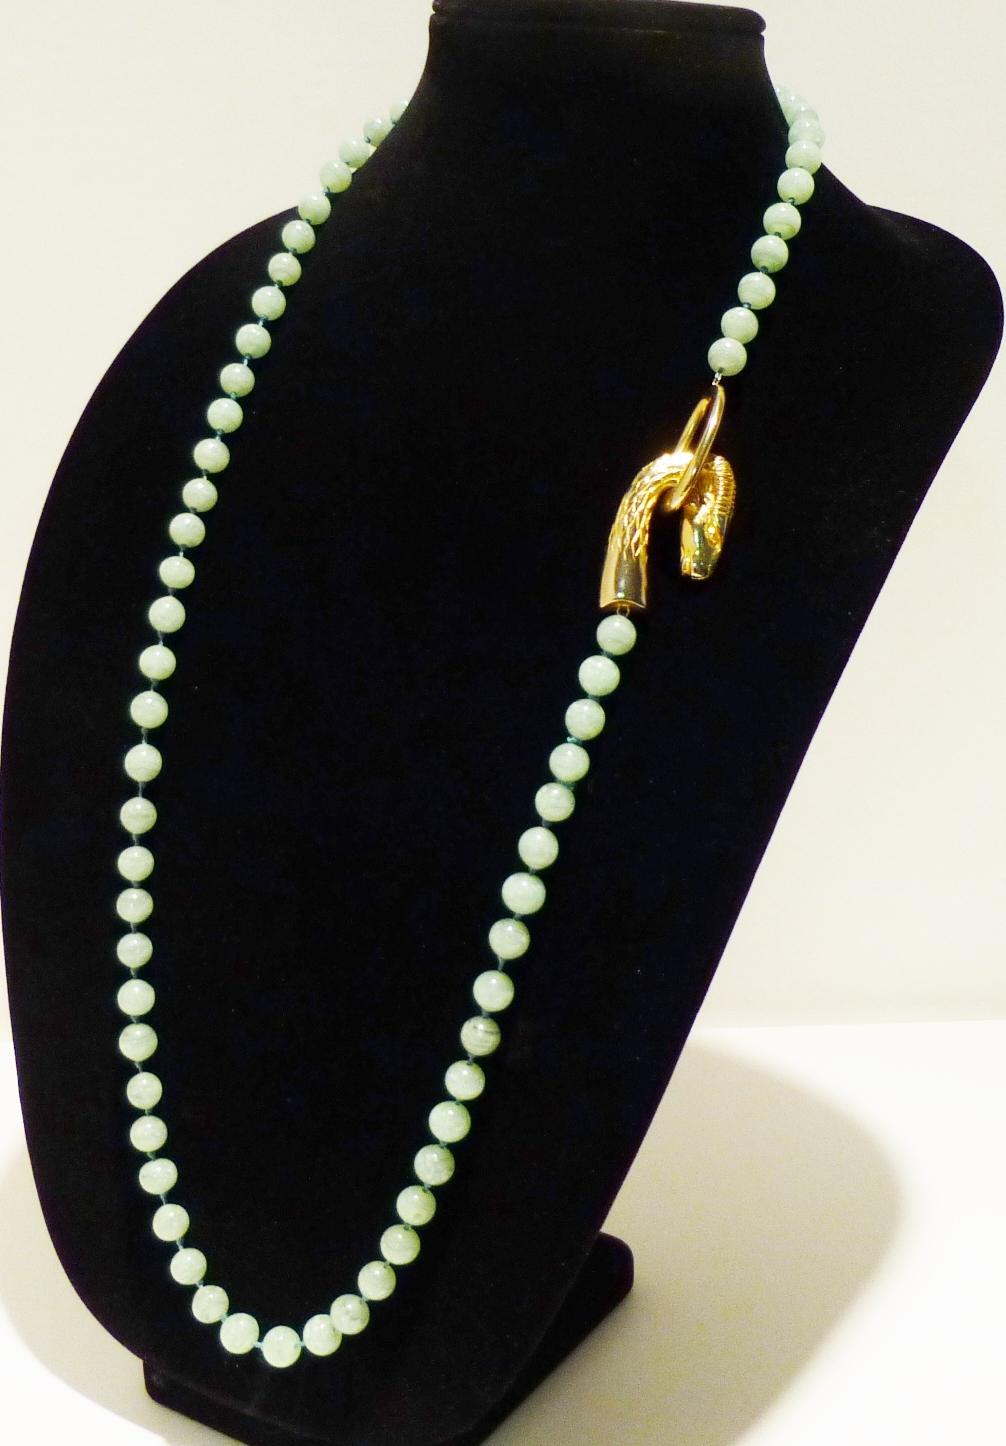 RARE! Unique Jade Necklace with Ram's Head Clasp